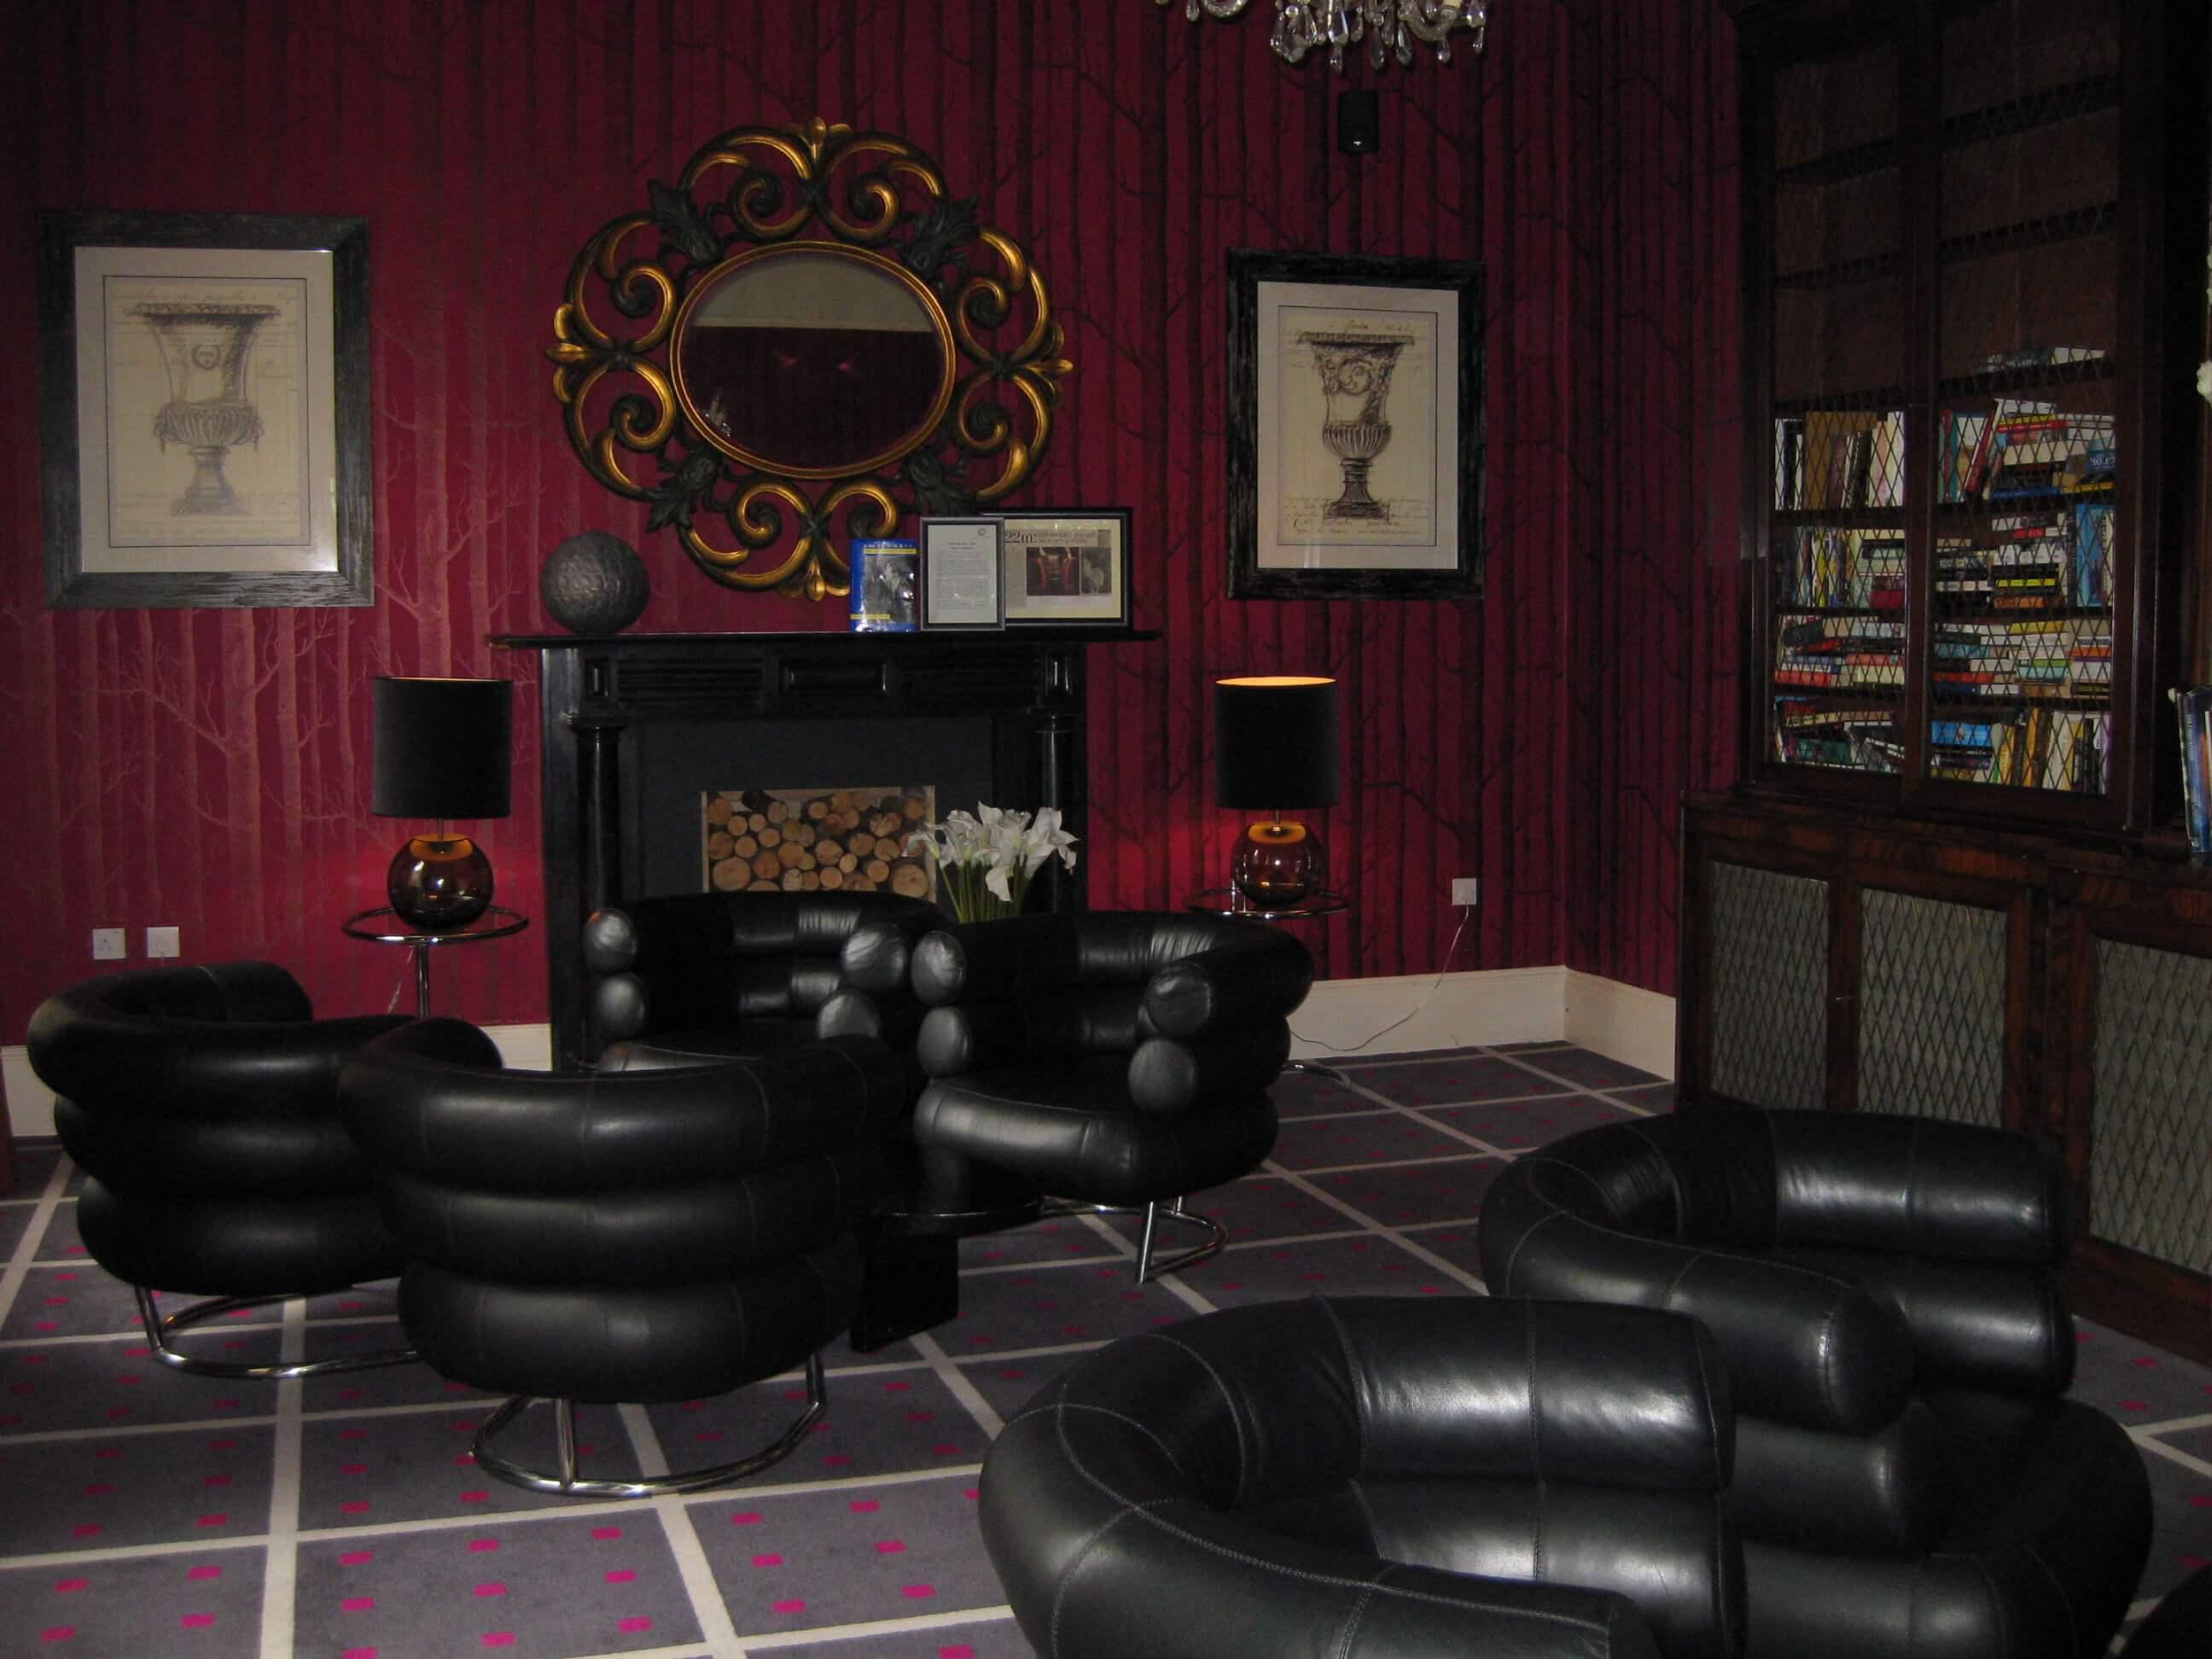 library room with dark seats at monart spa ireland